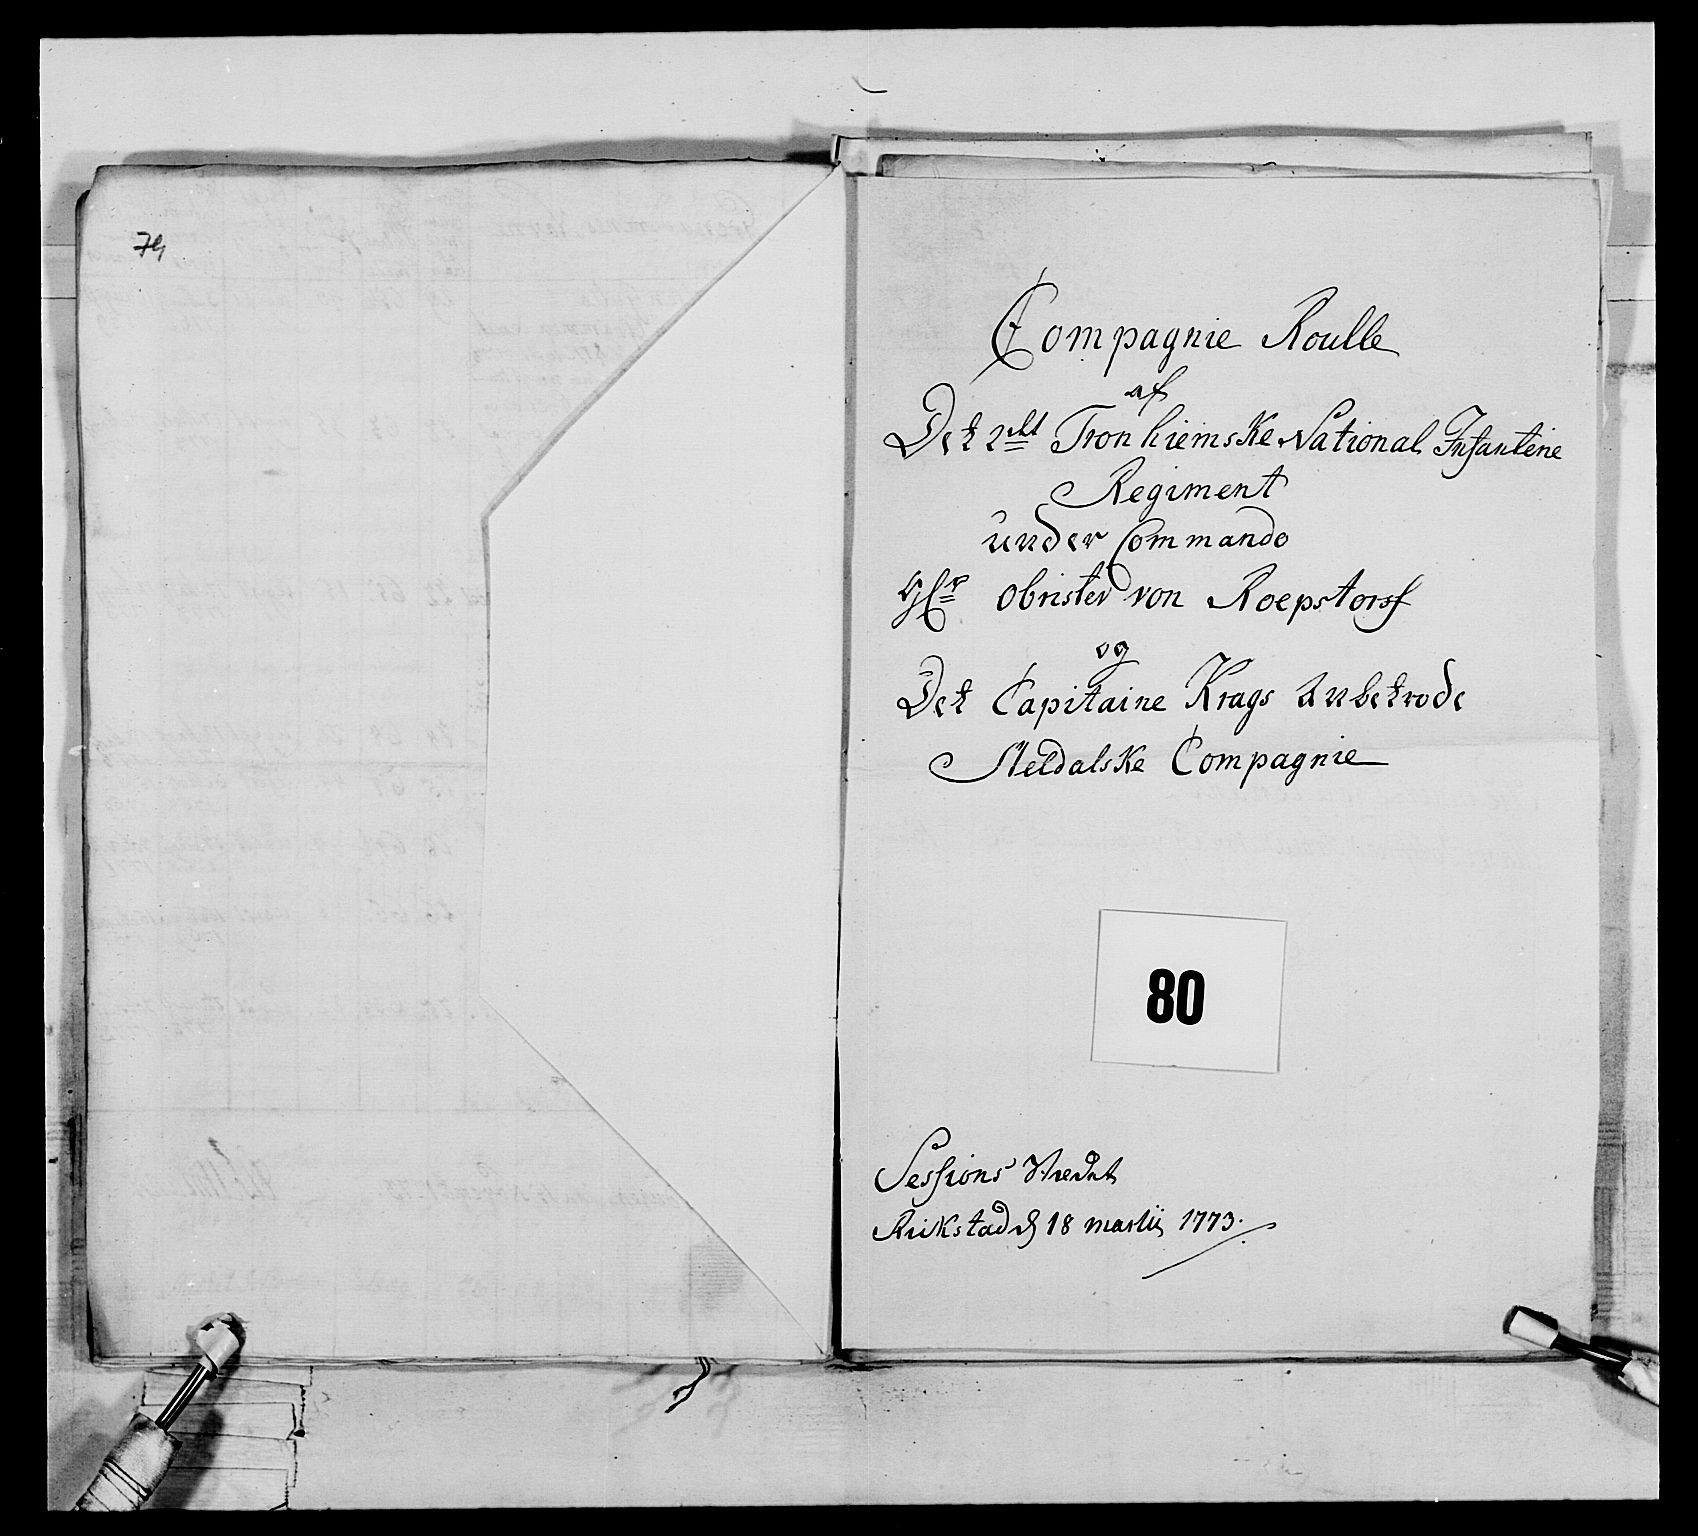 RA, Generalitets- og kommissariatskollegiet, Det kongelige norske kommissariatskollegium, E/Eh/L0076: 2. Trondheimske nasjonale infanteriregiment, 1766-1773, p. 417